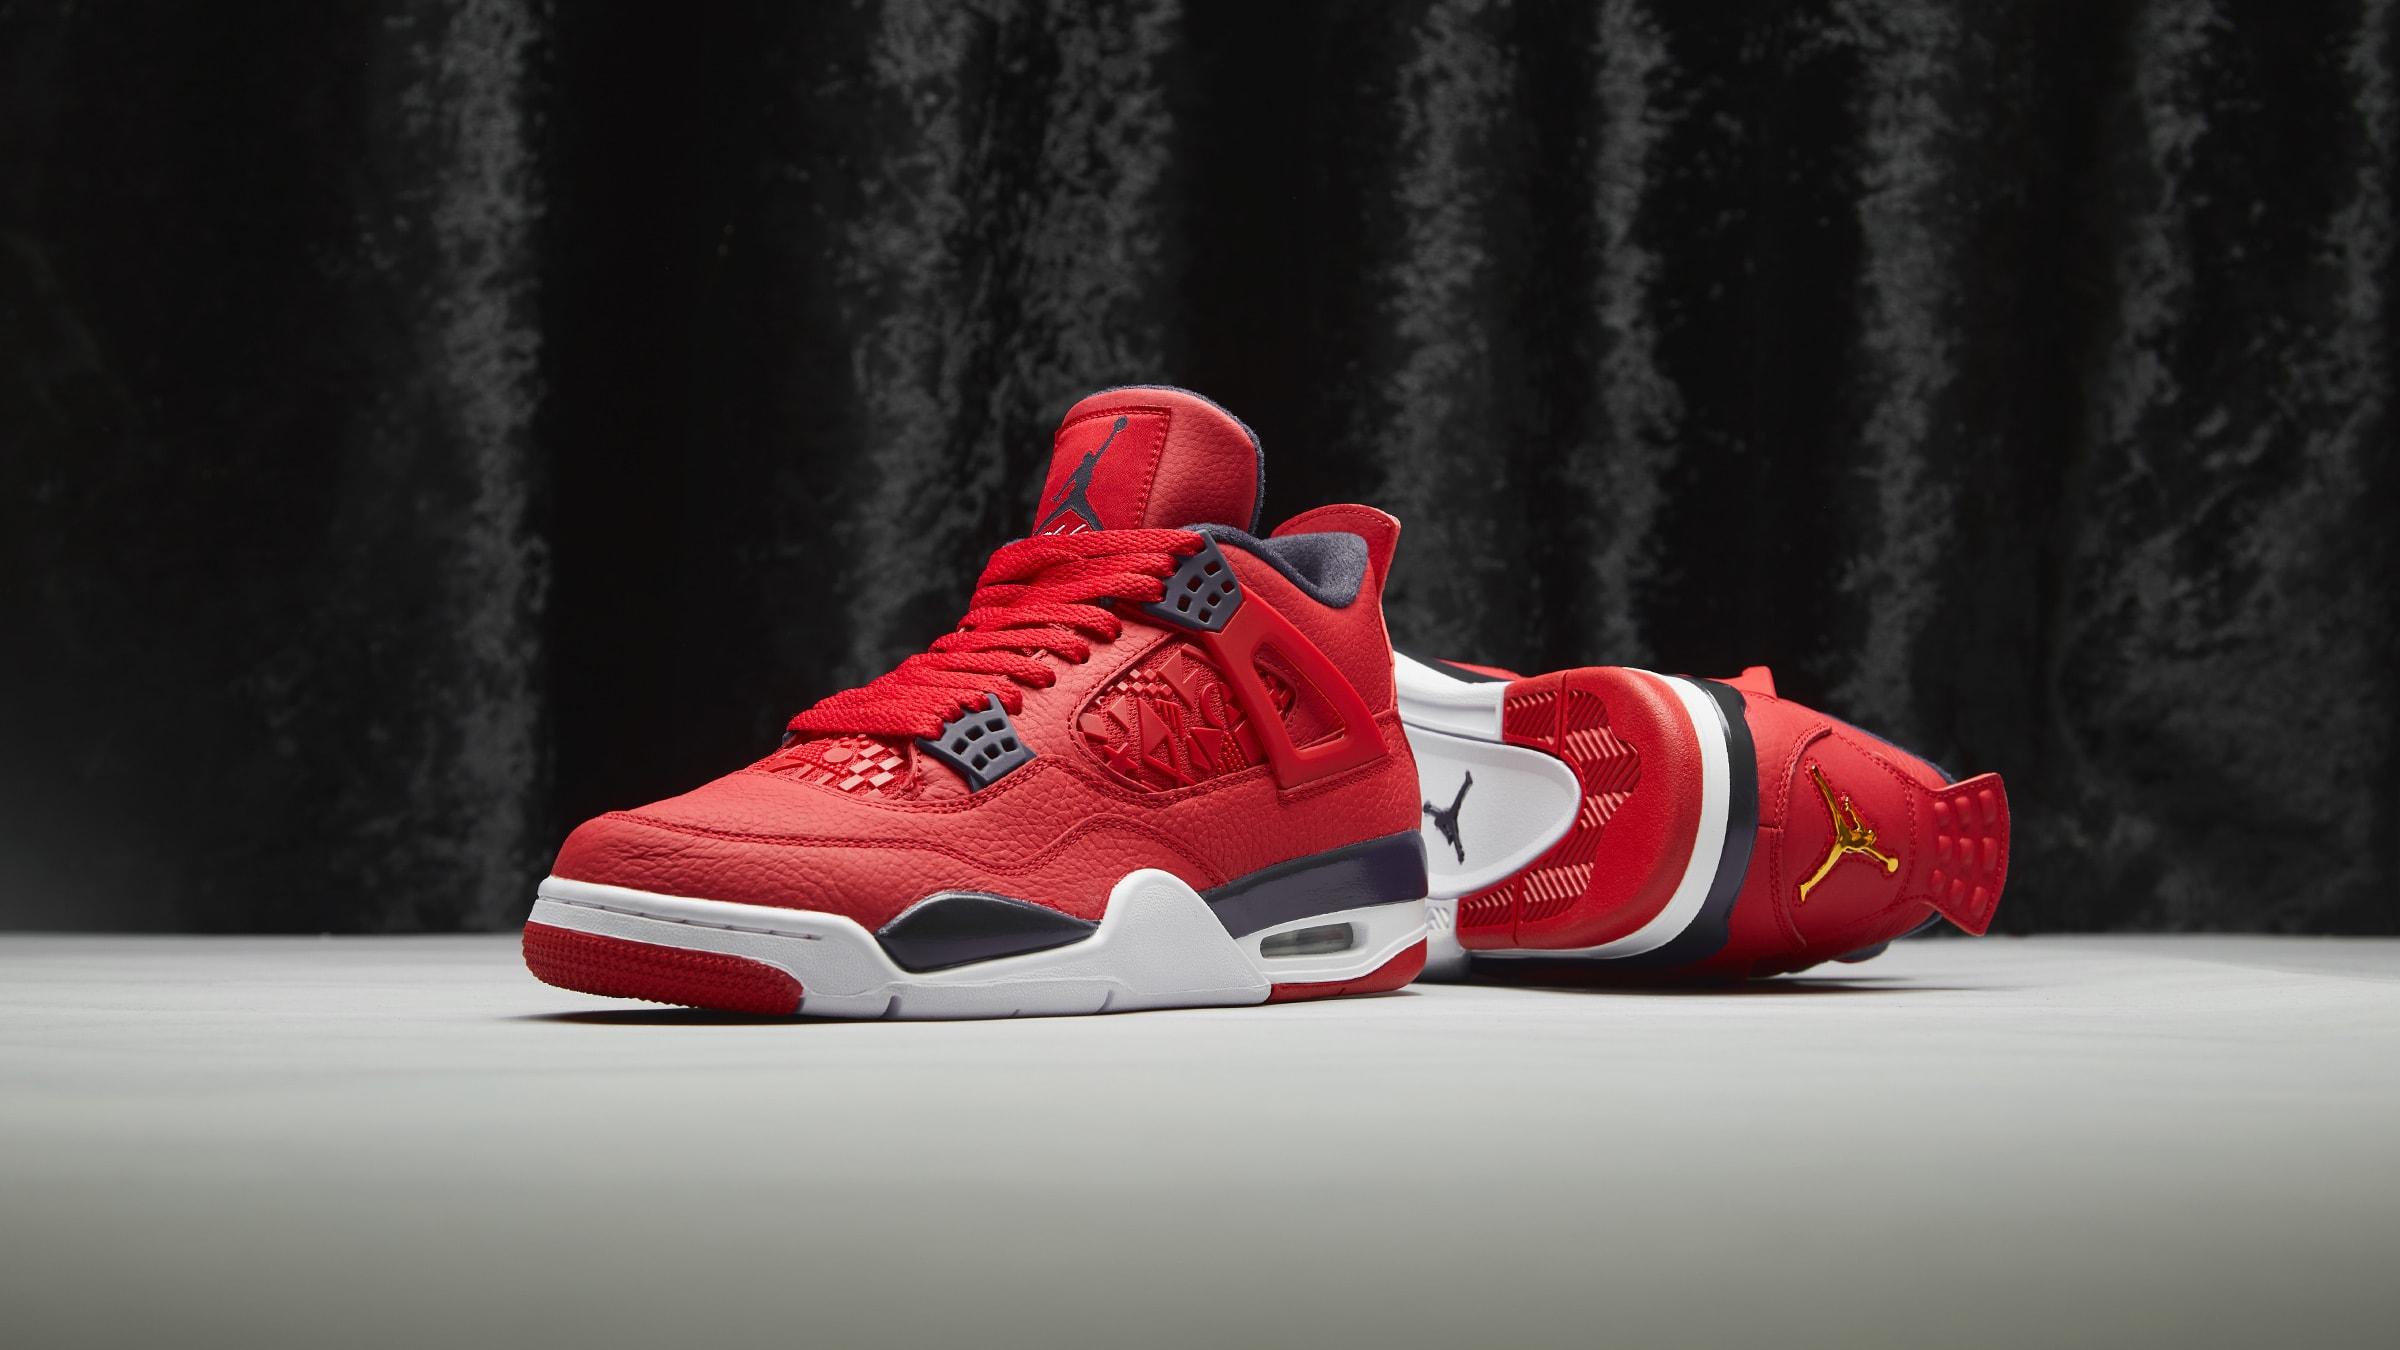 END. Features | Nike Air Jordan 4 FIBA